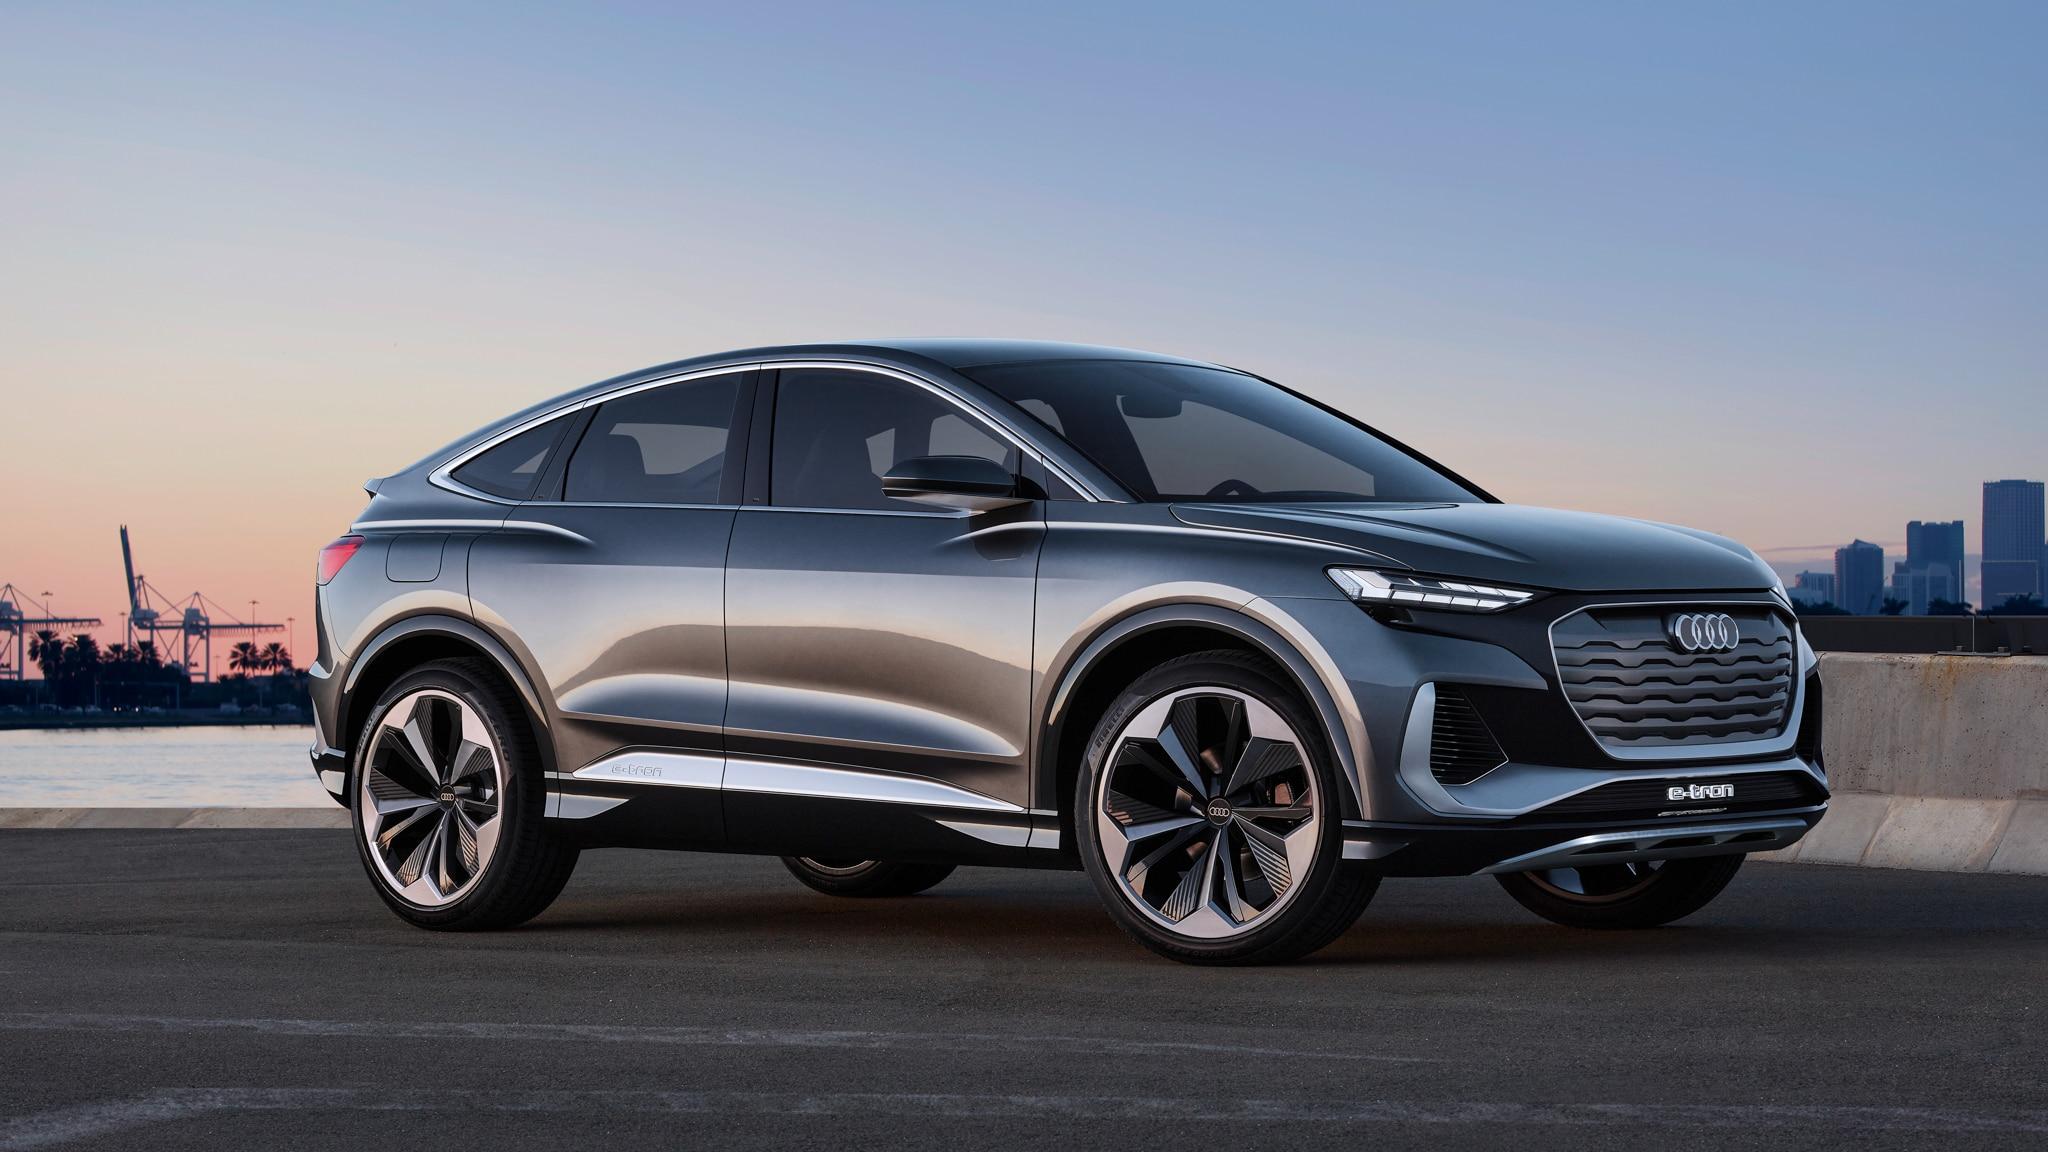 2022 Audi Q4 E-Tron Sportback Concept First Look